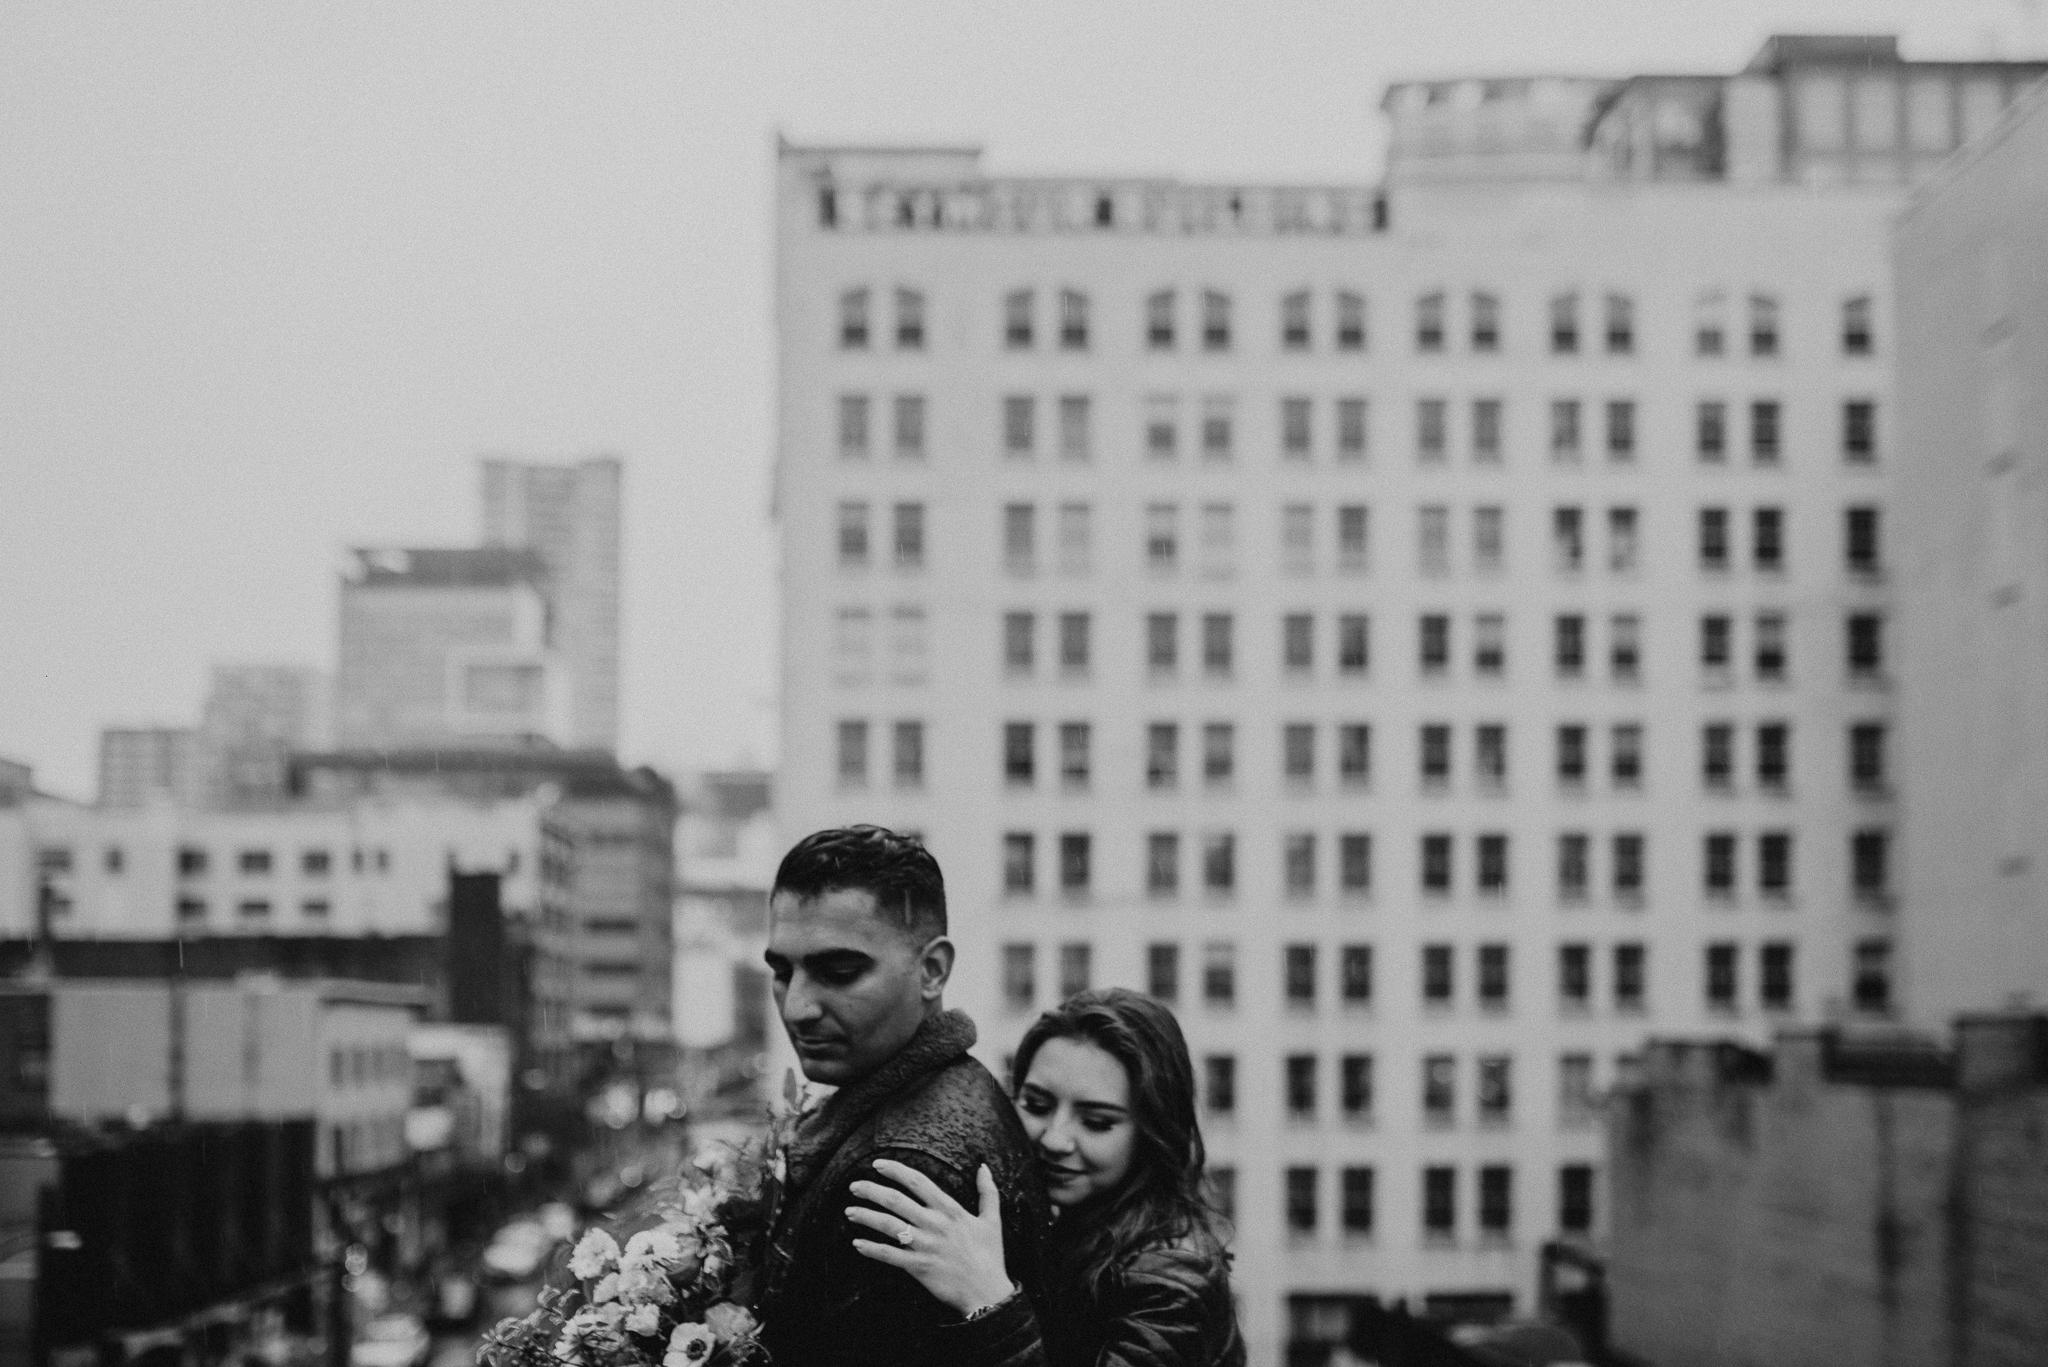 Maddie & Jas Gastown Vancouver Engagement Session - Laura Olson Photography - Sunshine Coast BC Photographer - Vancouver Photographer-3089.jpg